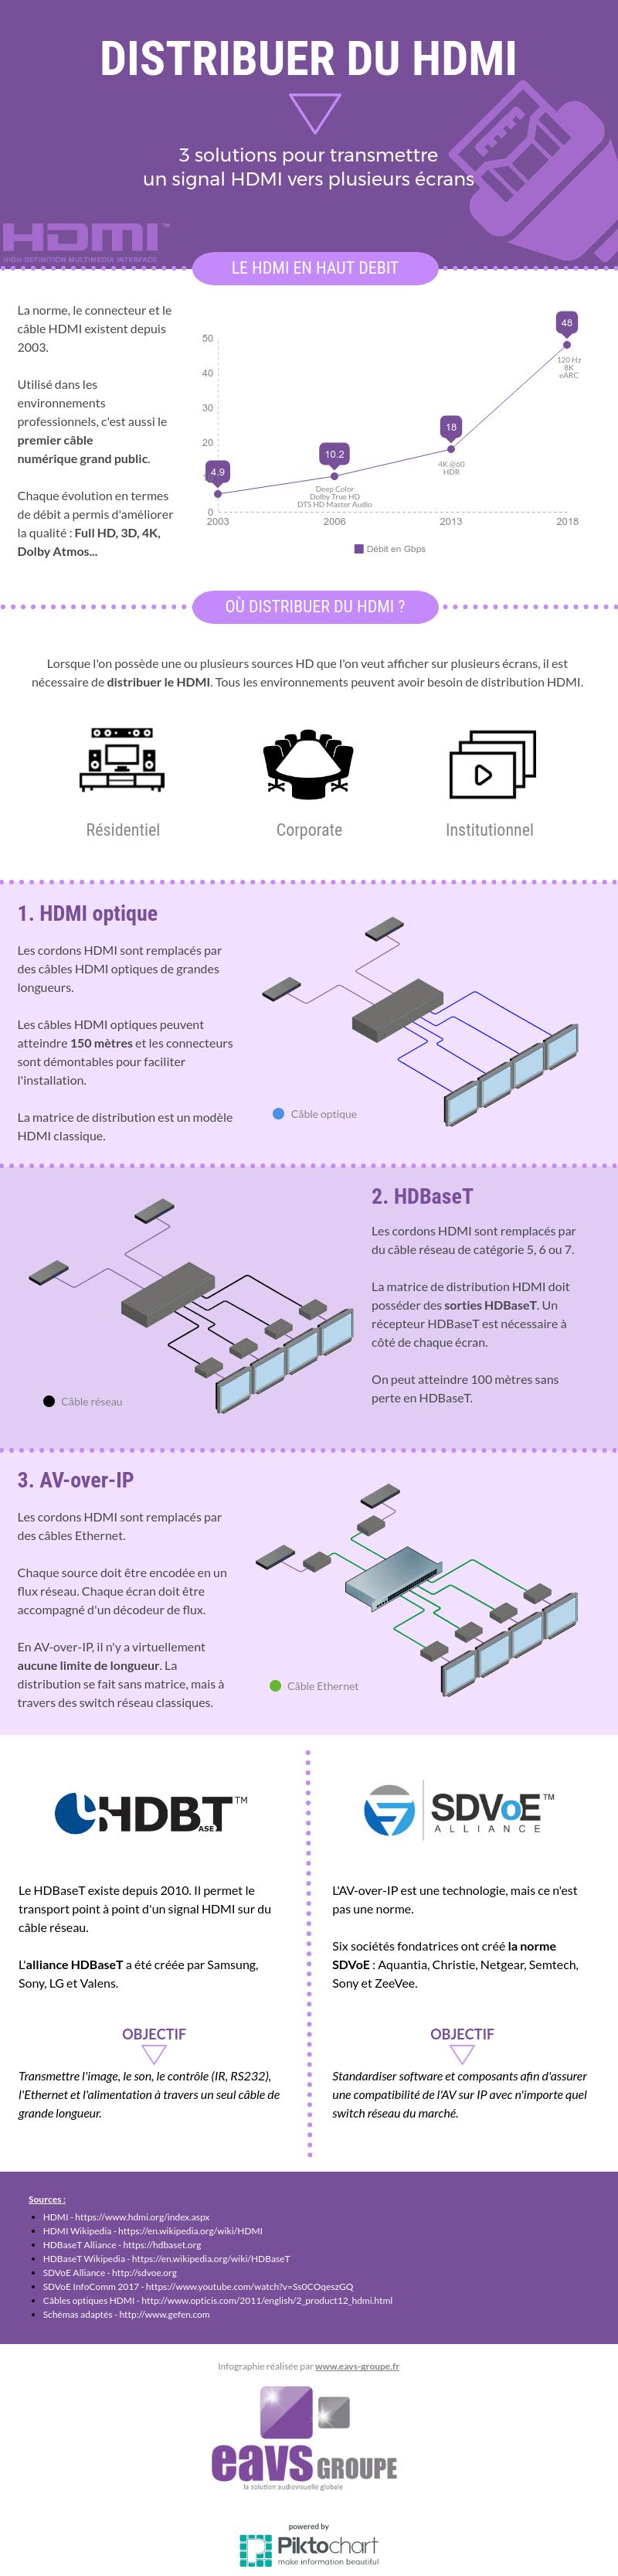 infographie distribution HDMI eavs